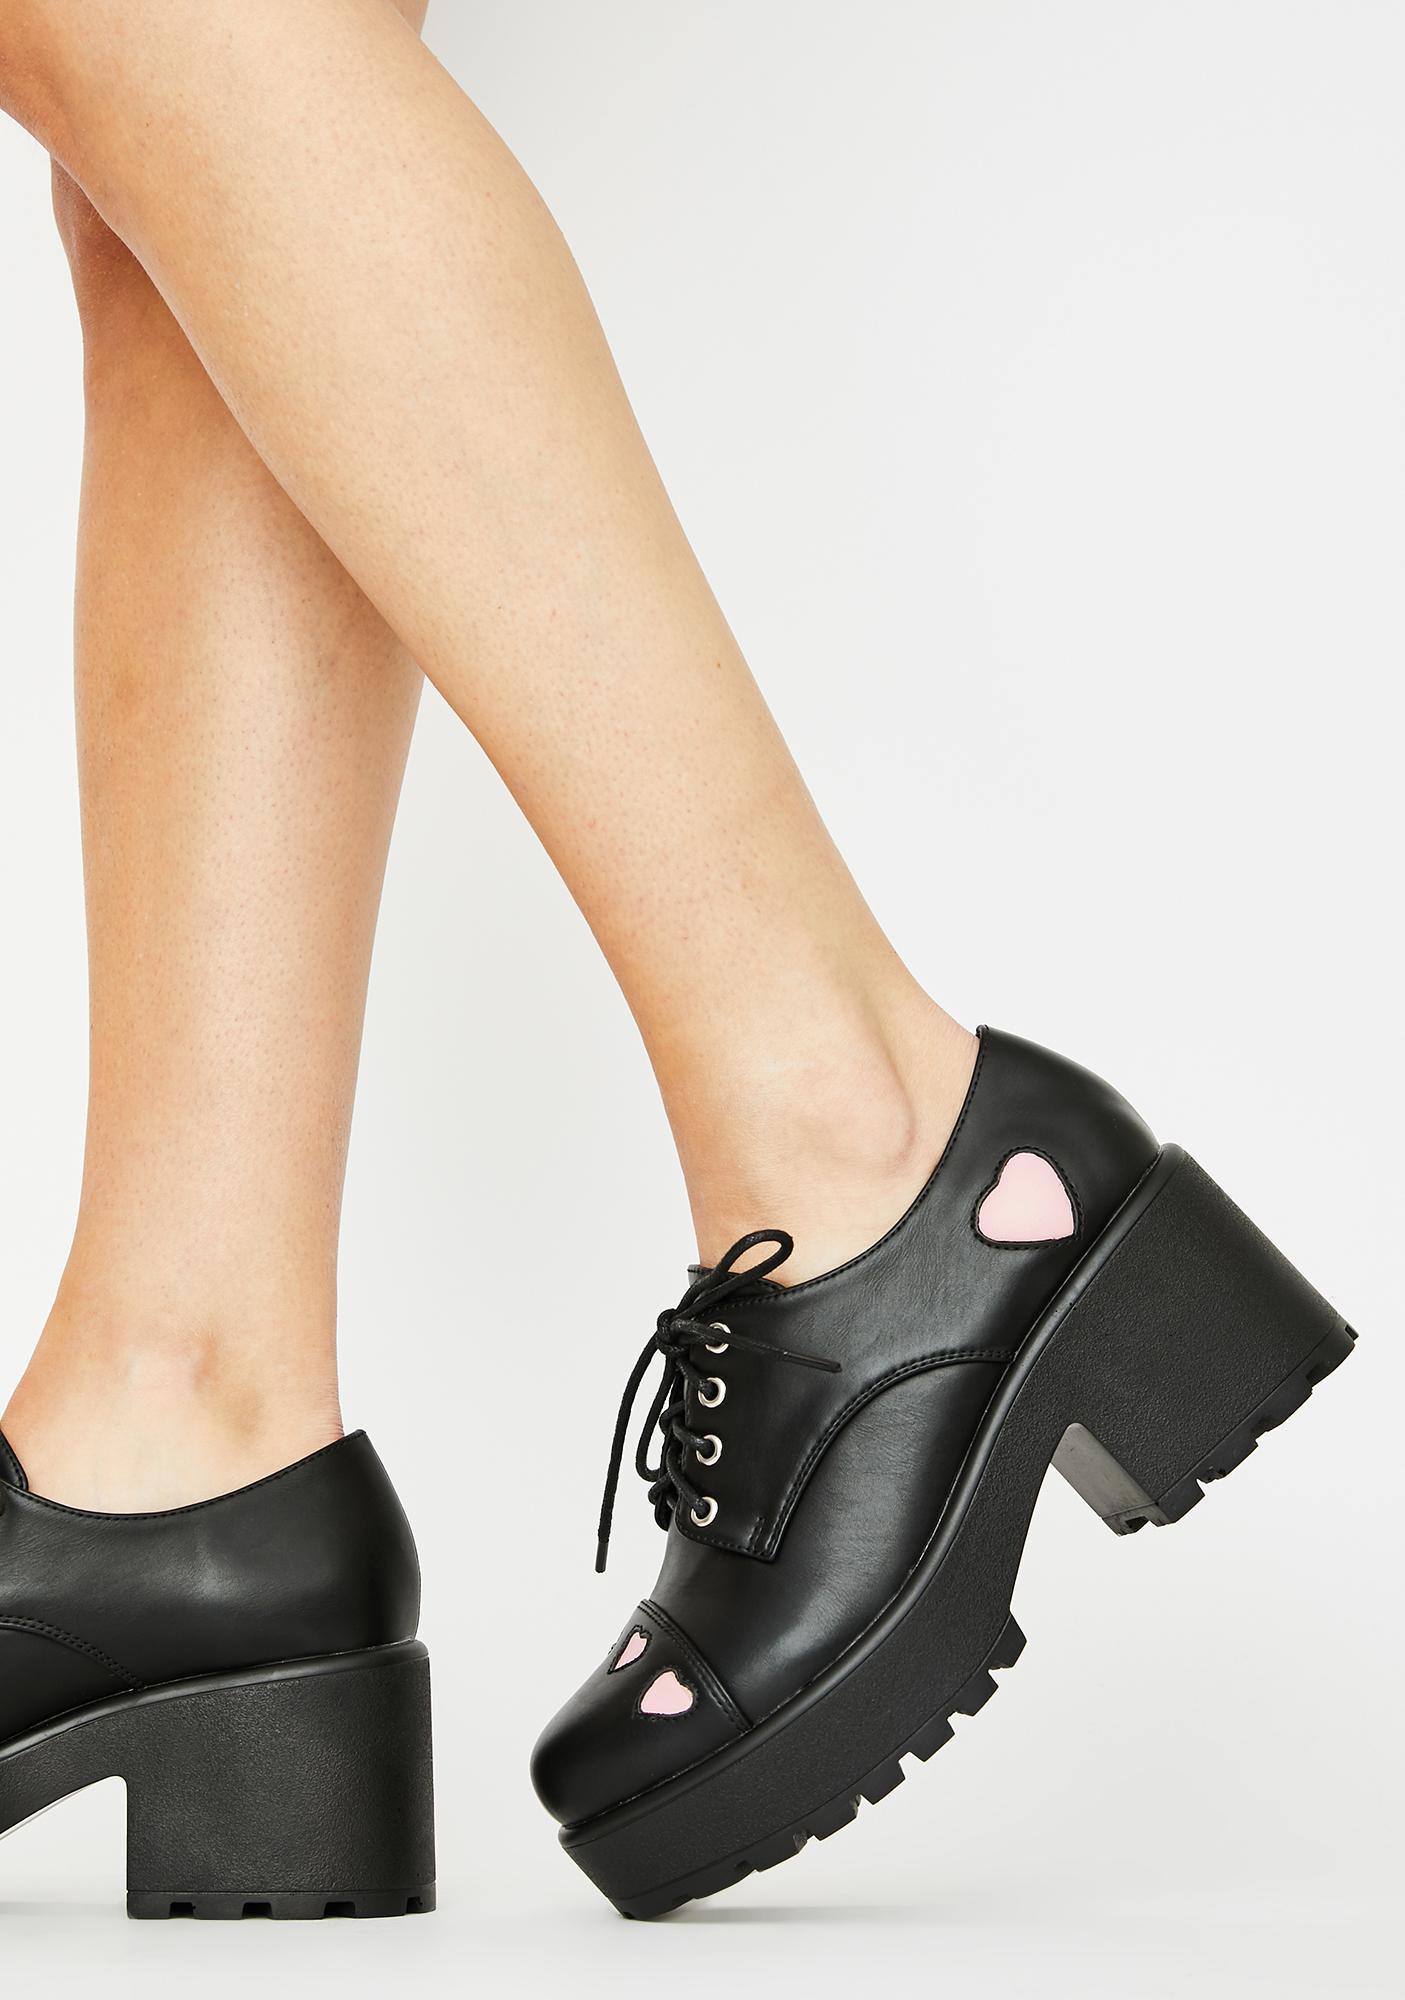 Koi Footwear Pink Heart Tennin Platform Oxfords